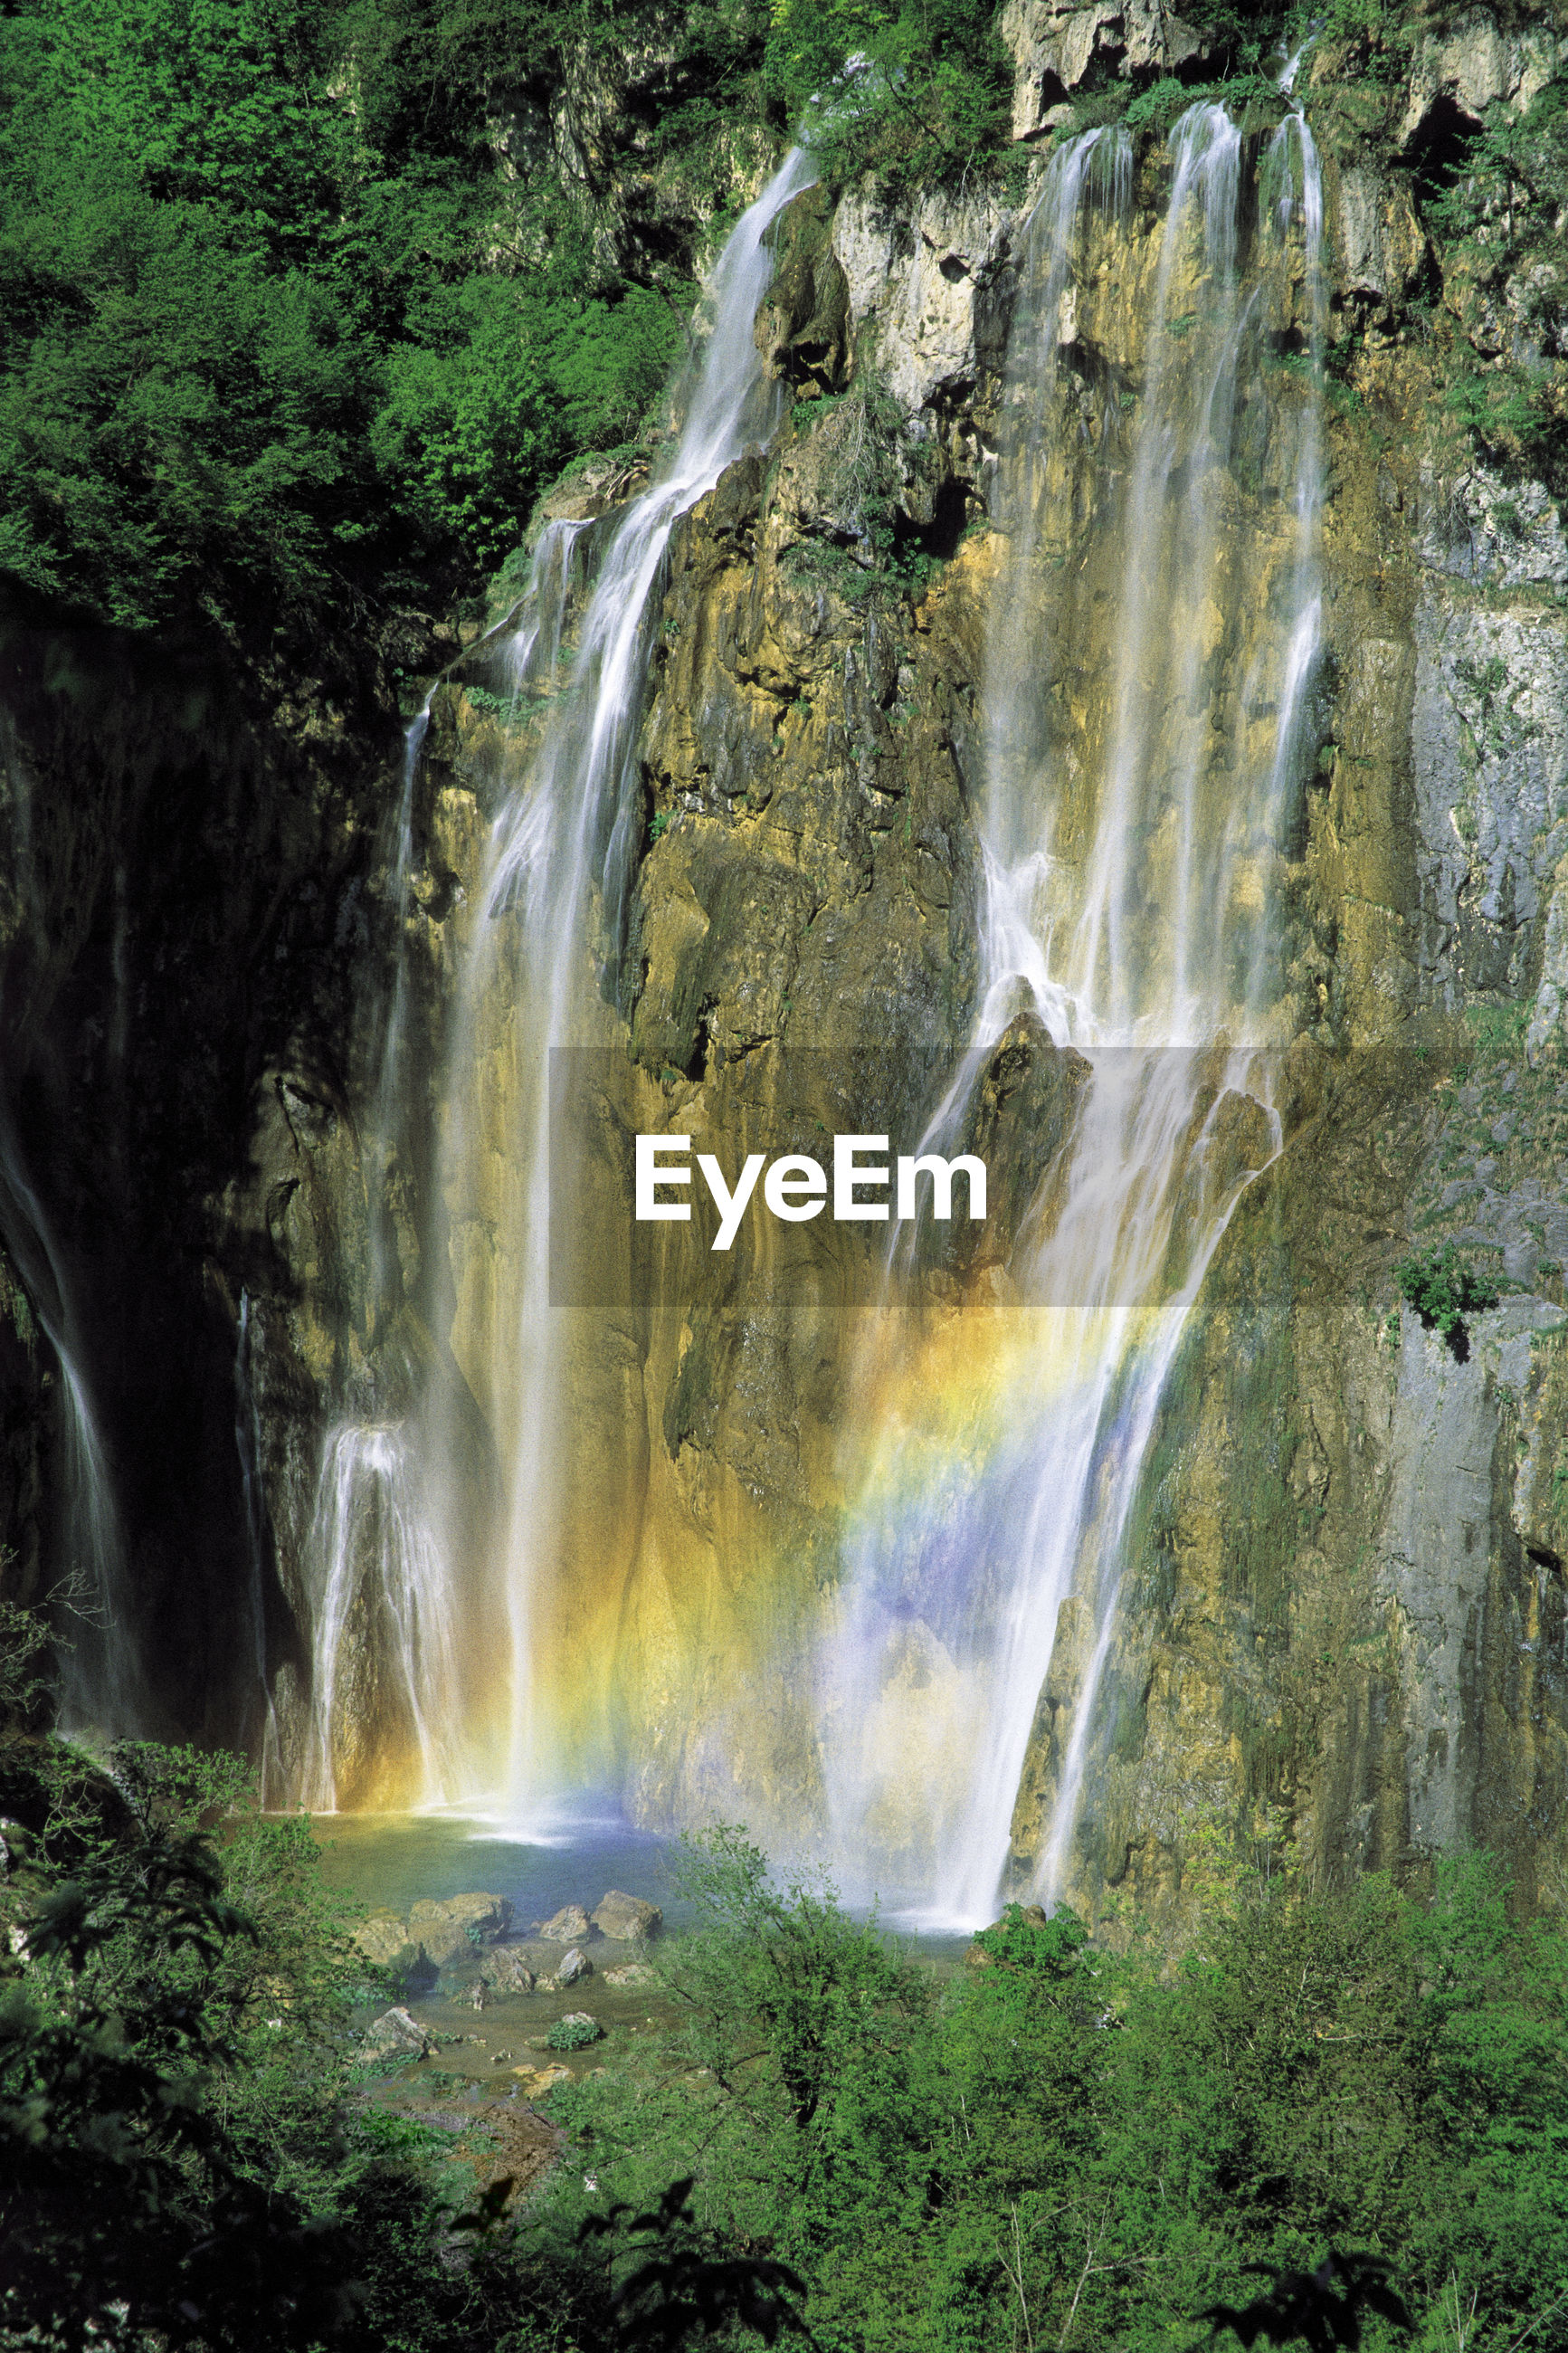 Waterfalls in the plitivce lakes, croatia